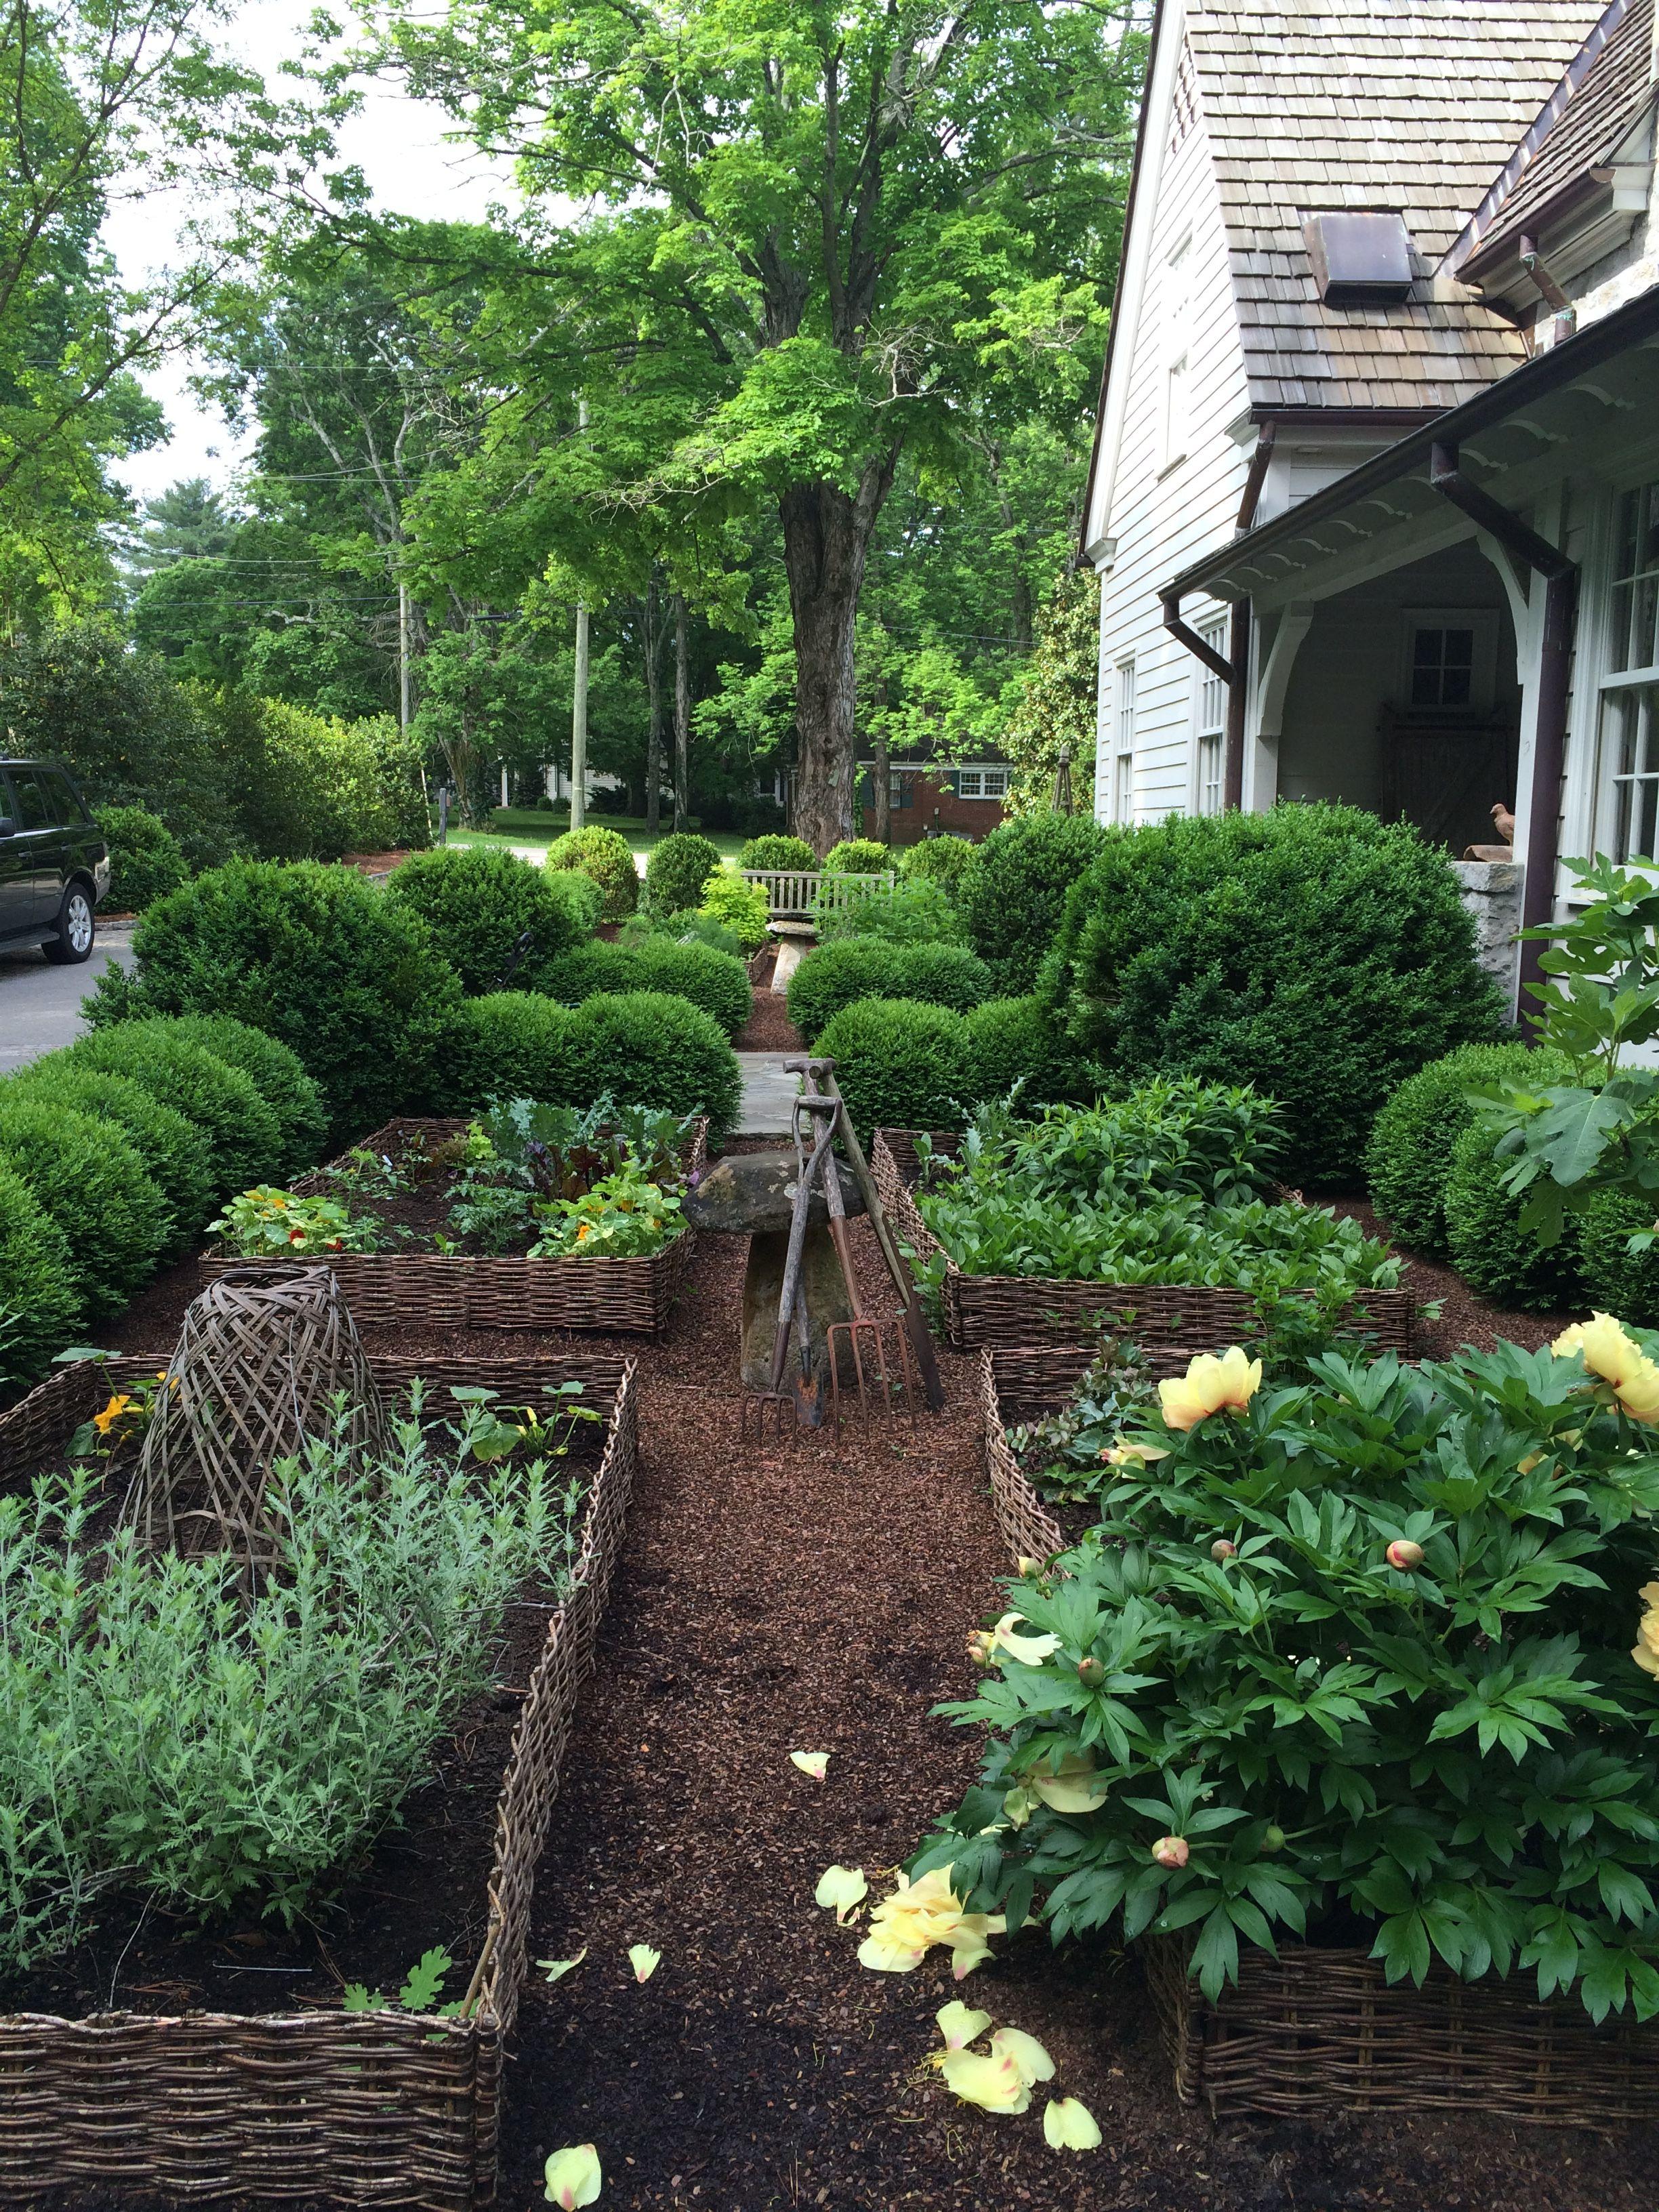 Fullsize Of Fence Around Garden